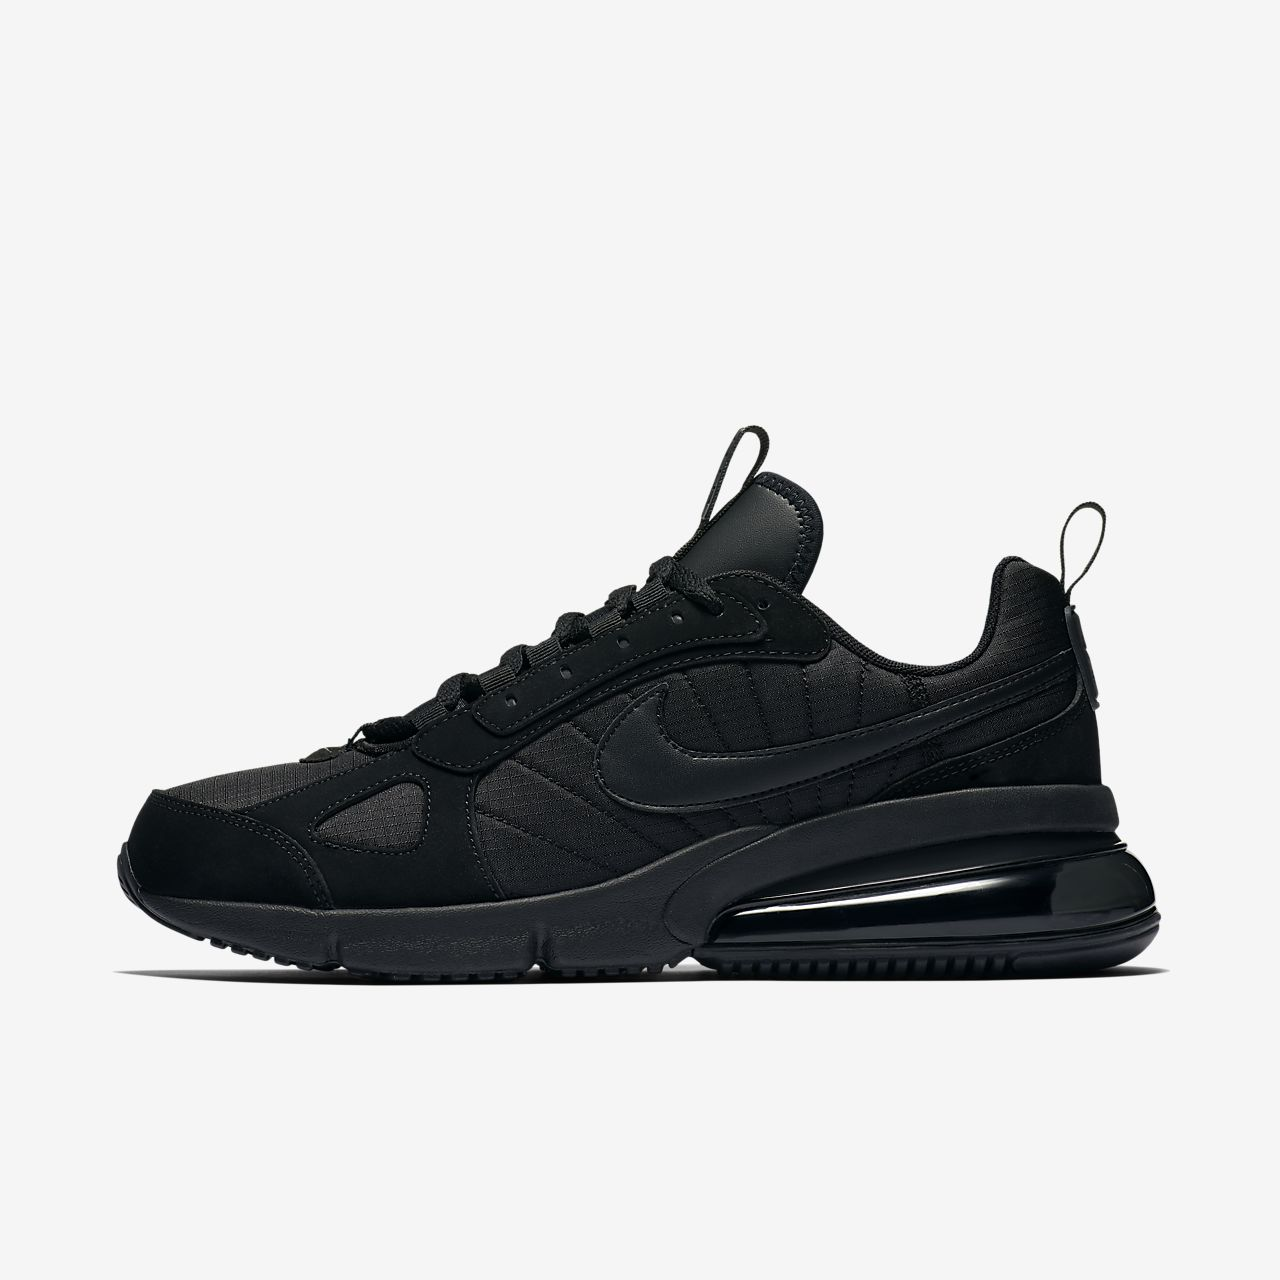 ebf618343a ... new arrivals scarpa nike air max 270 futura uomo f1471 d1d49